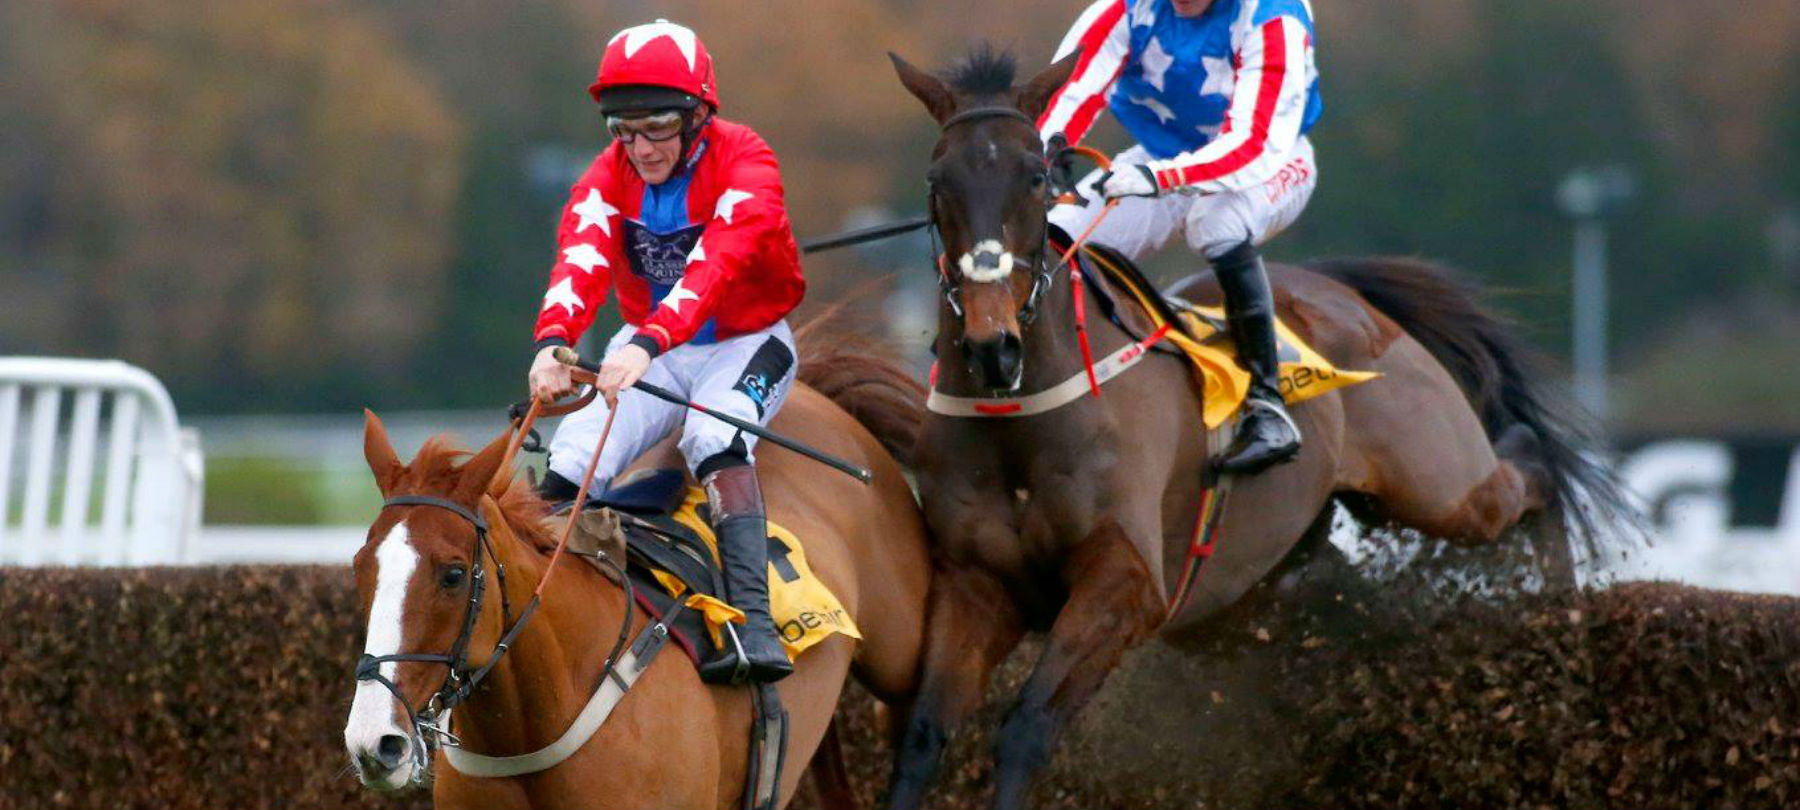 two-horses-finishing-jump-hero.jpg